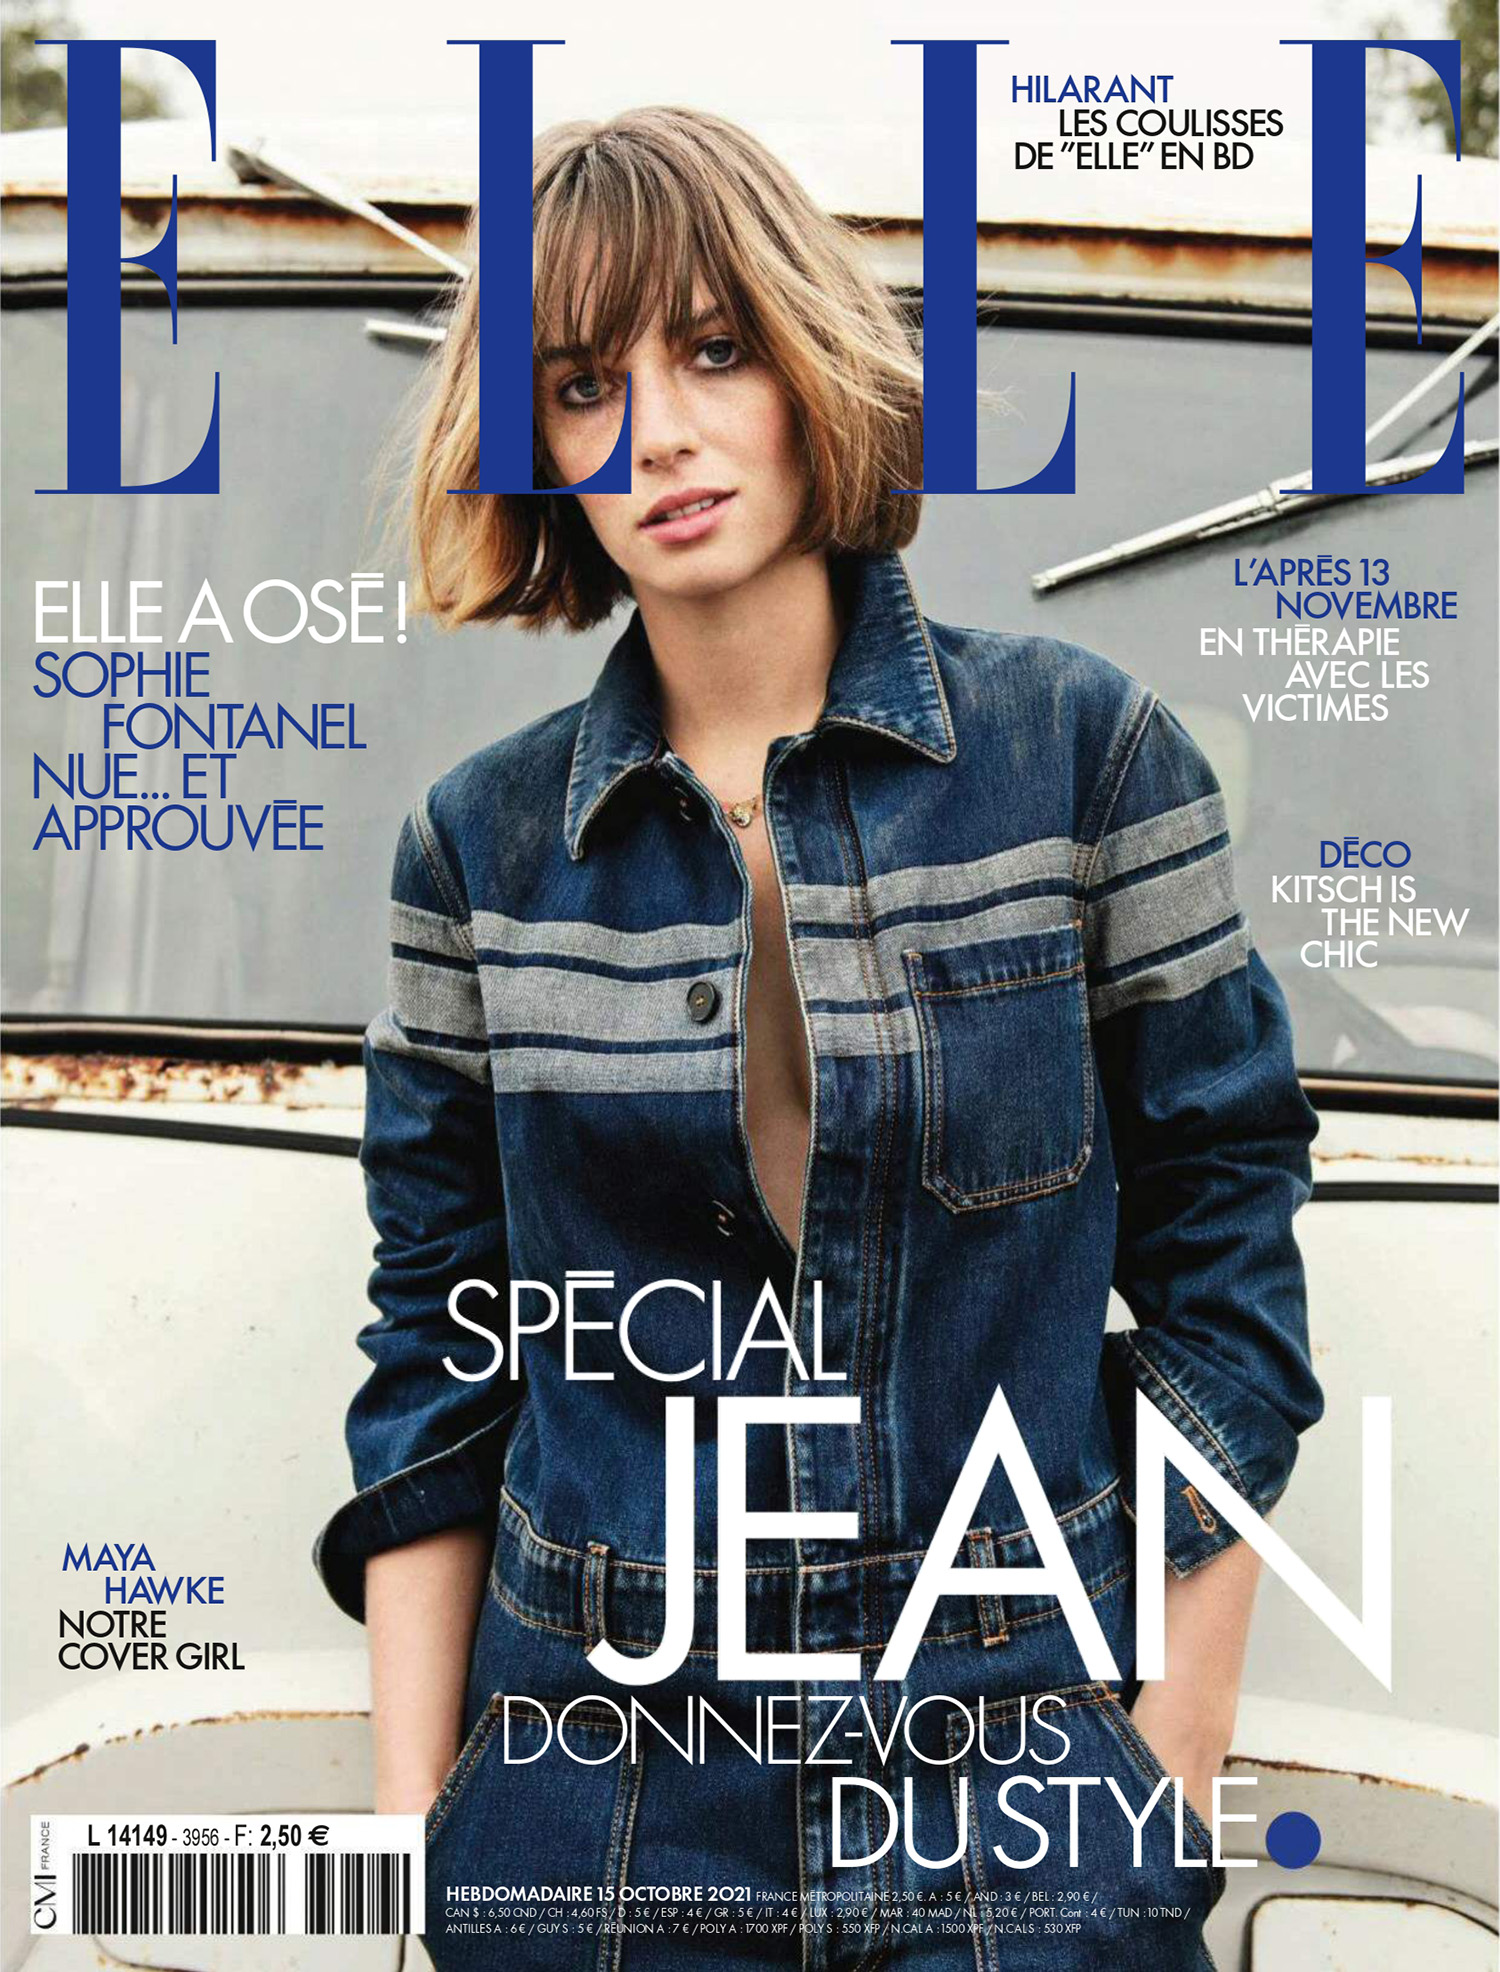 Maya Hawke covers Elle France October 15th, 2021 by Claudia Knoepfel